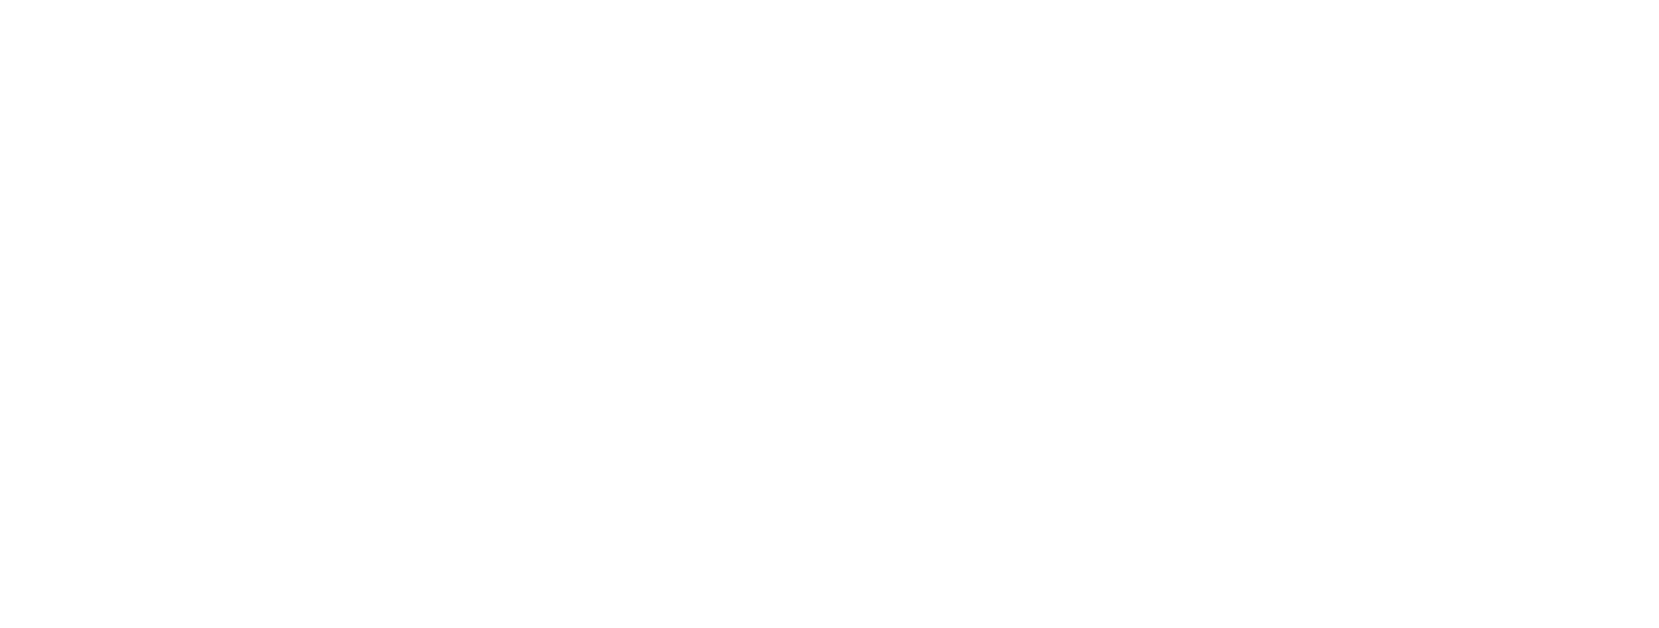 Strunk Dodge Aiken Zovas, Attorneys at Law LLC